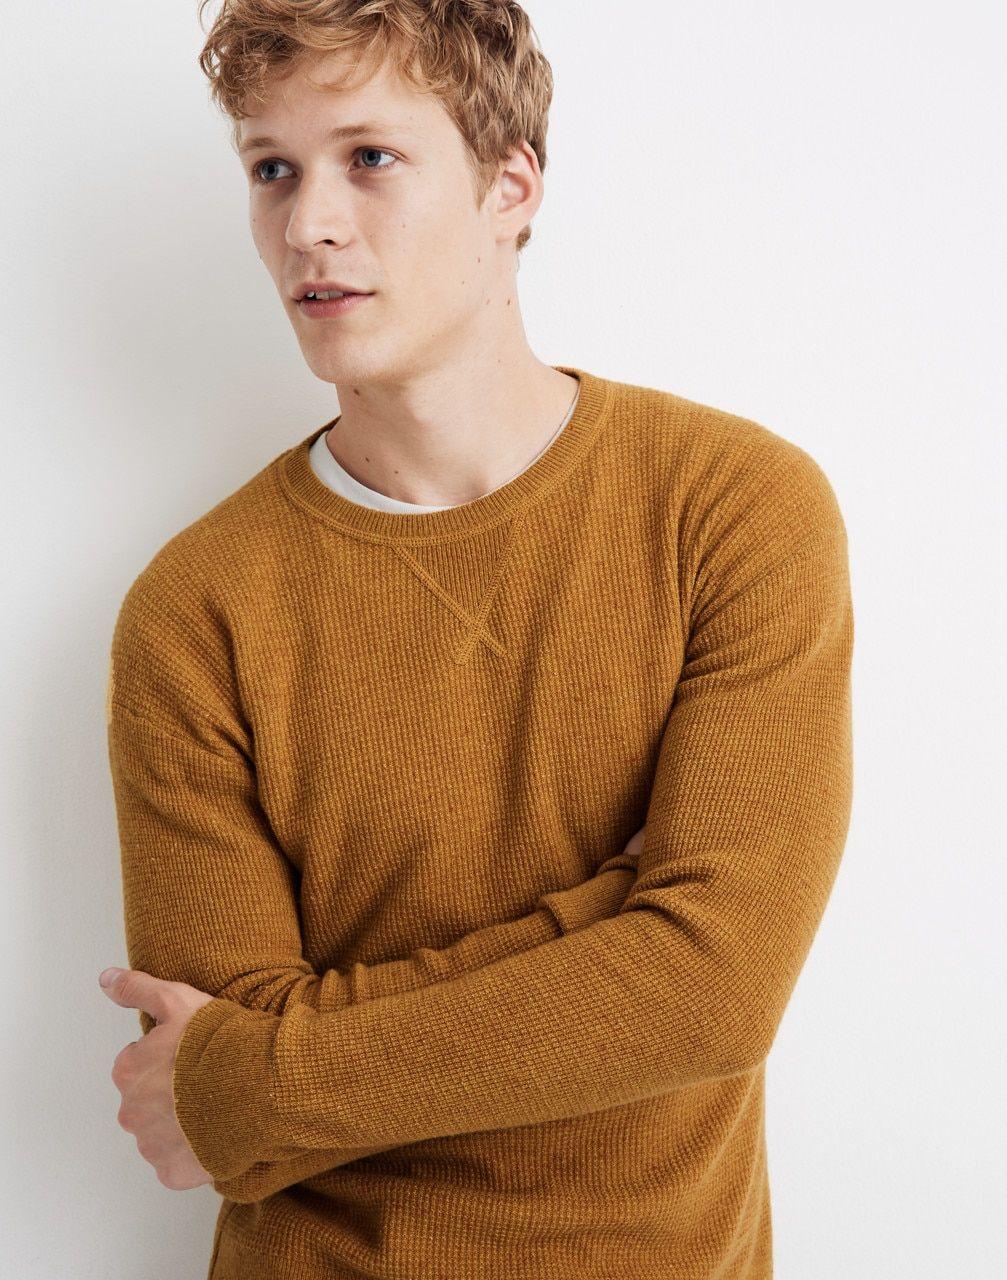 Men S Donegal Cashmere Sweatshirt Denim Jacket Men Mens Outfits Sweatshirts [ 1280 x 1007 Pixel ]